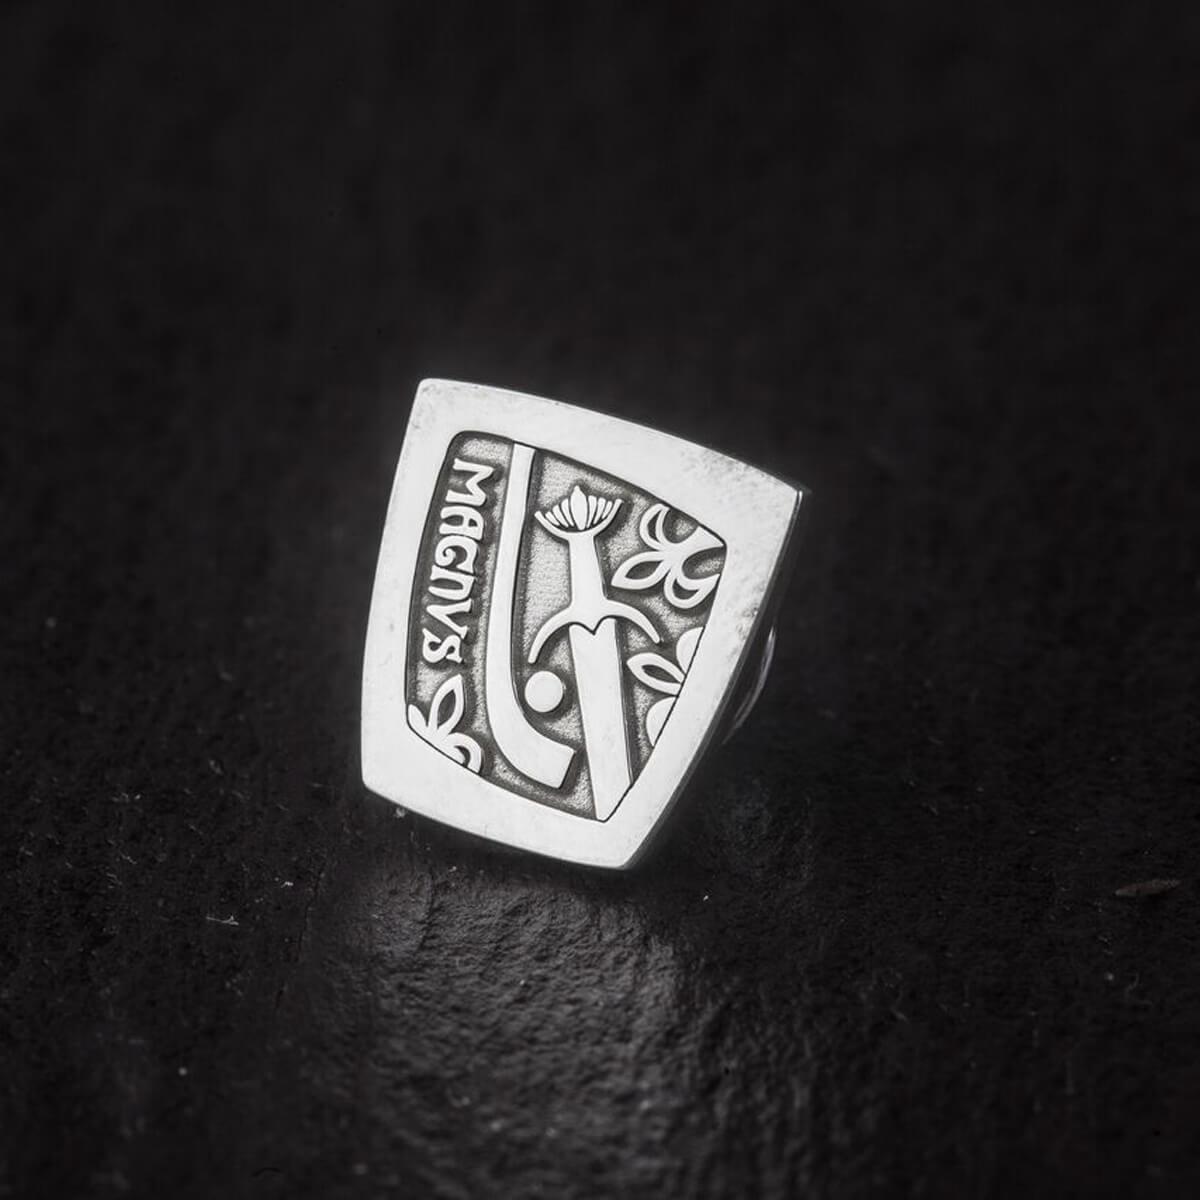 Faller Galloglas Magnus, Scots Gaelic, Scottish claymore, camán, hurley, pendant, GAA Museum, medieval, Clonca, Culdaff, Inishowen, Co. Donegal, Ireland, Magnus Mac Orristin, Fergus Mac Allan, Gallóglaich, Gallowglass warrior, lapel pin, sterling silver